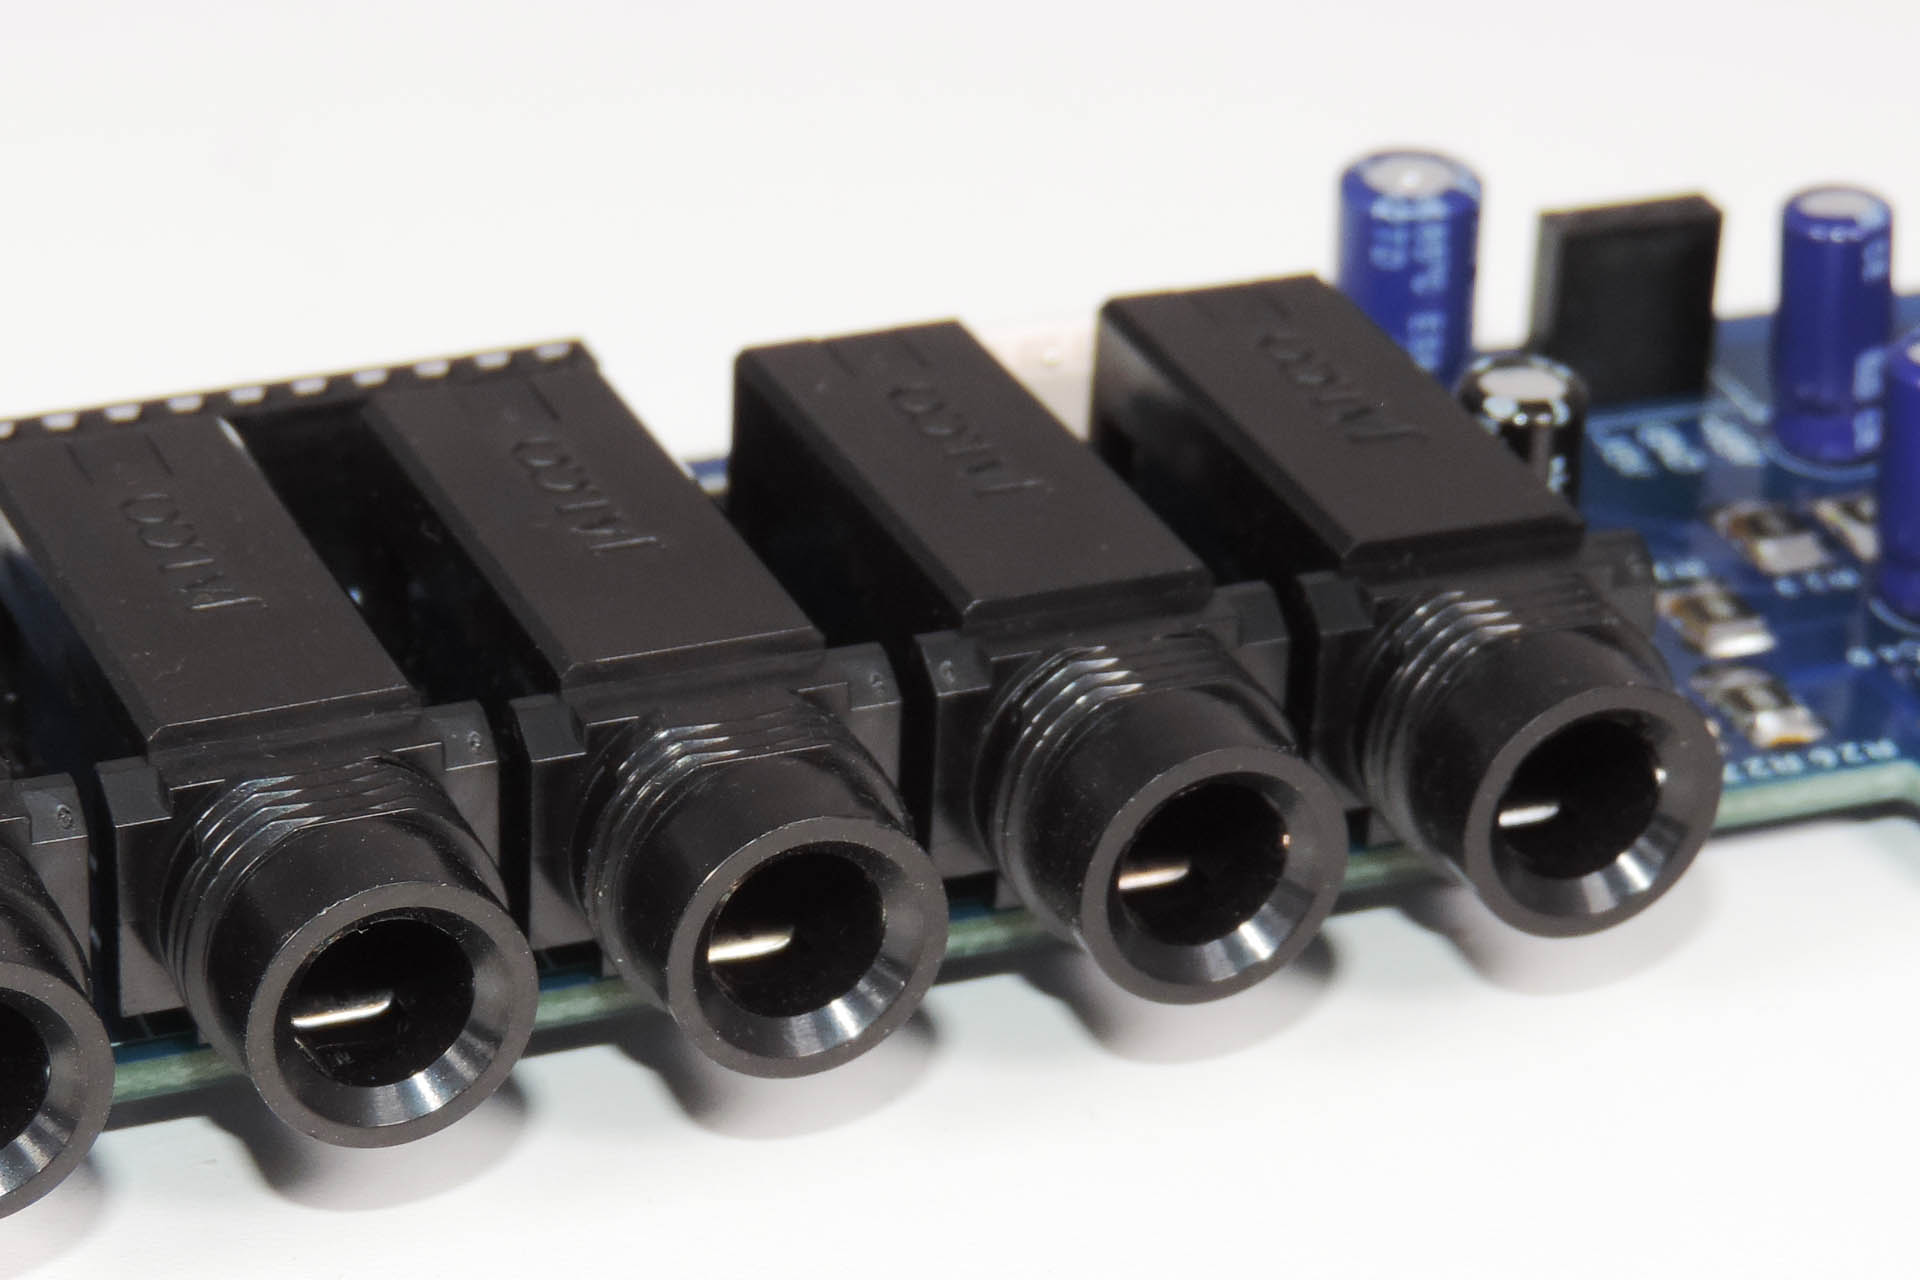 Nebula balanced output sockets are the same series as the original sockets